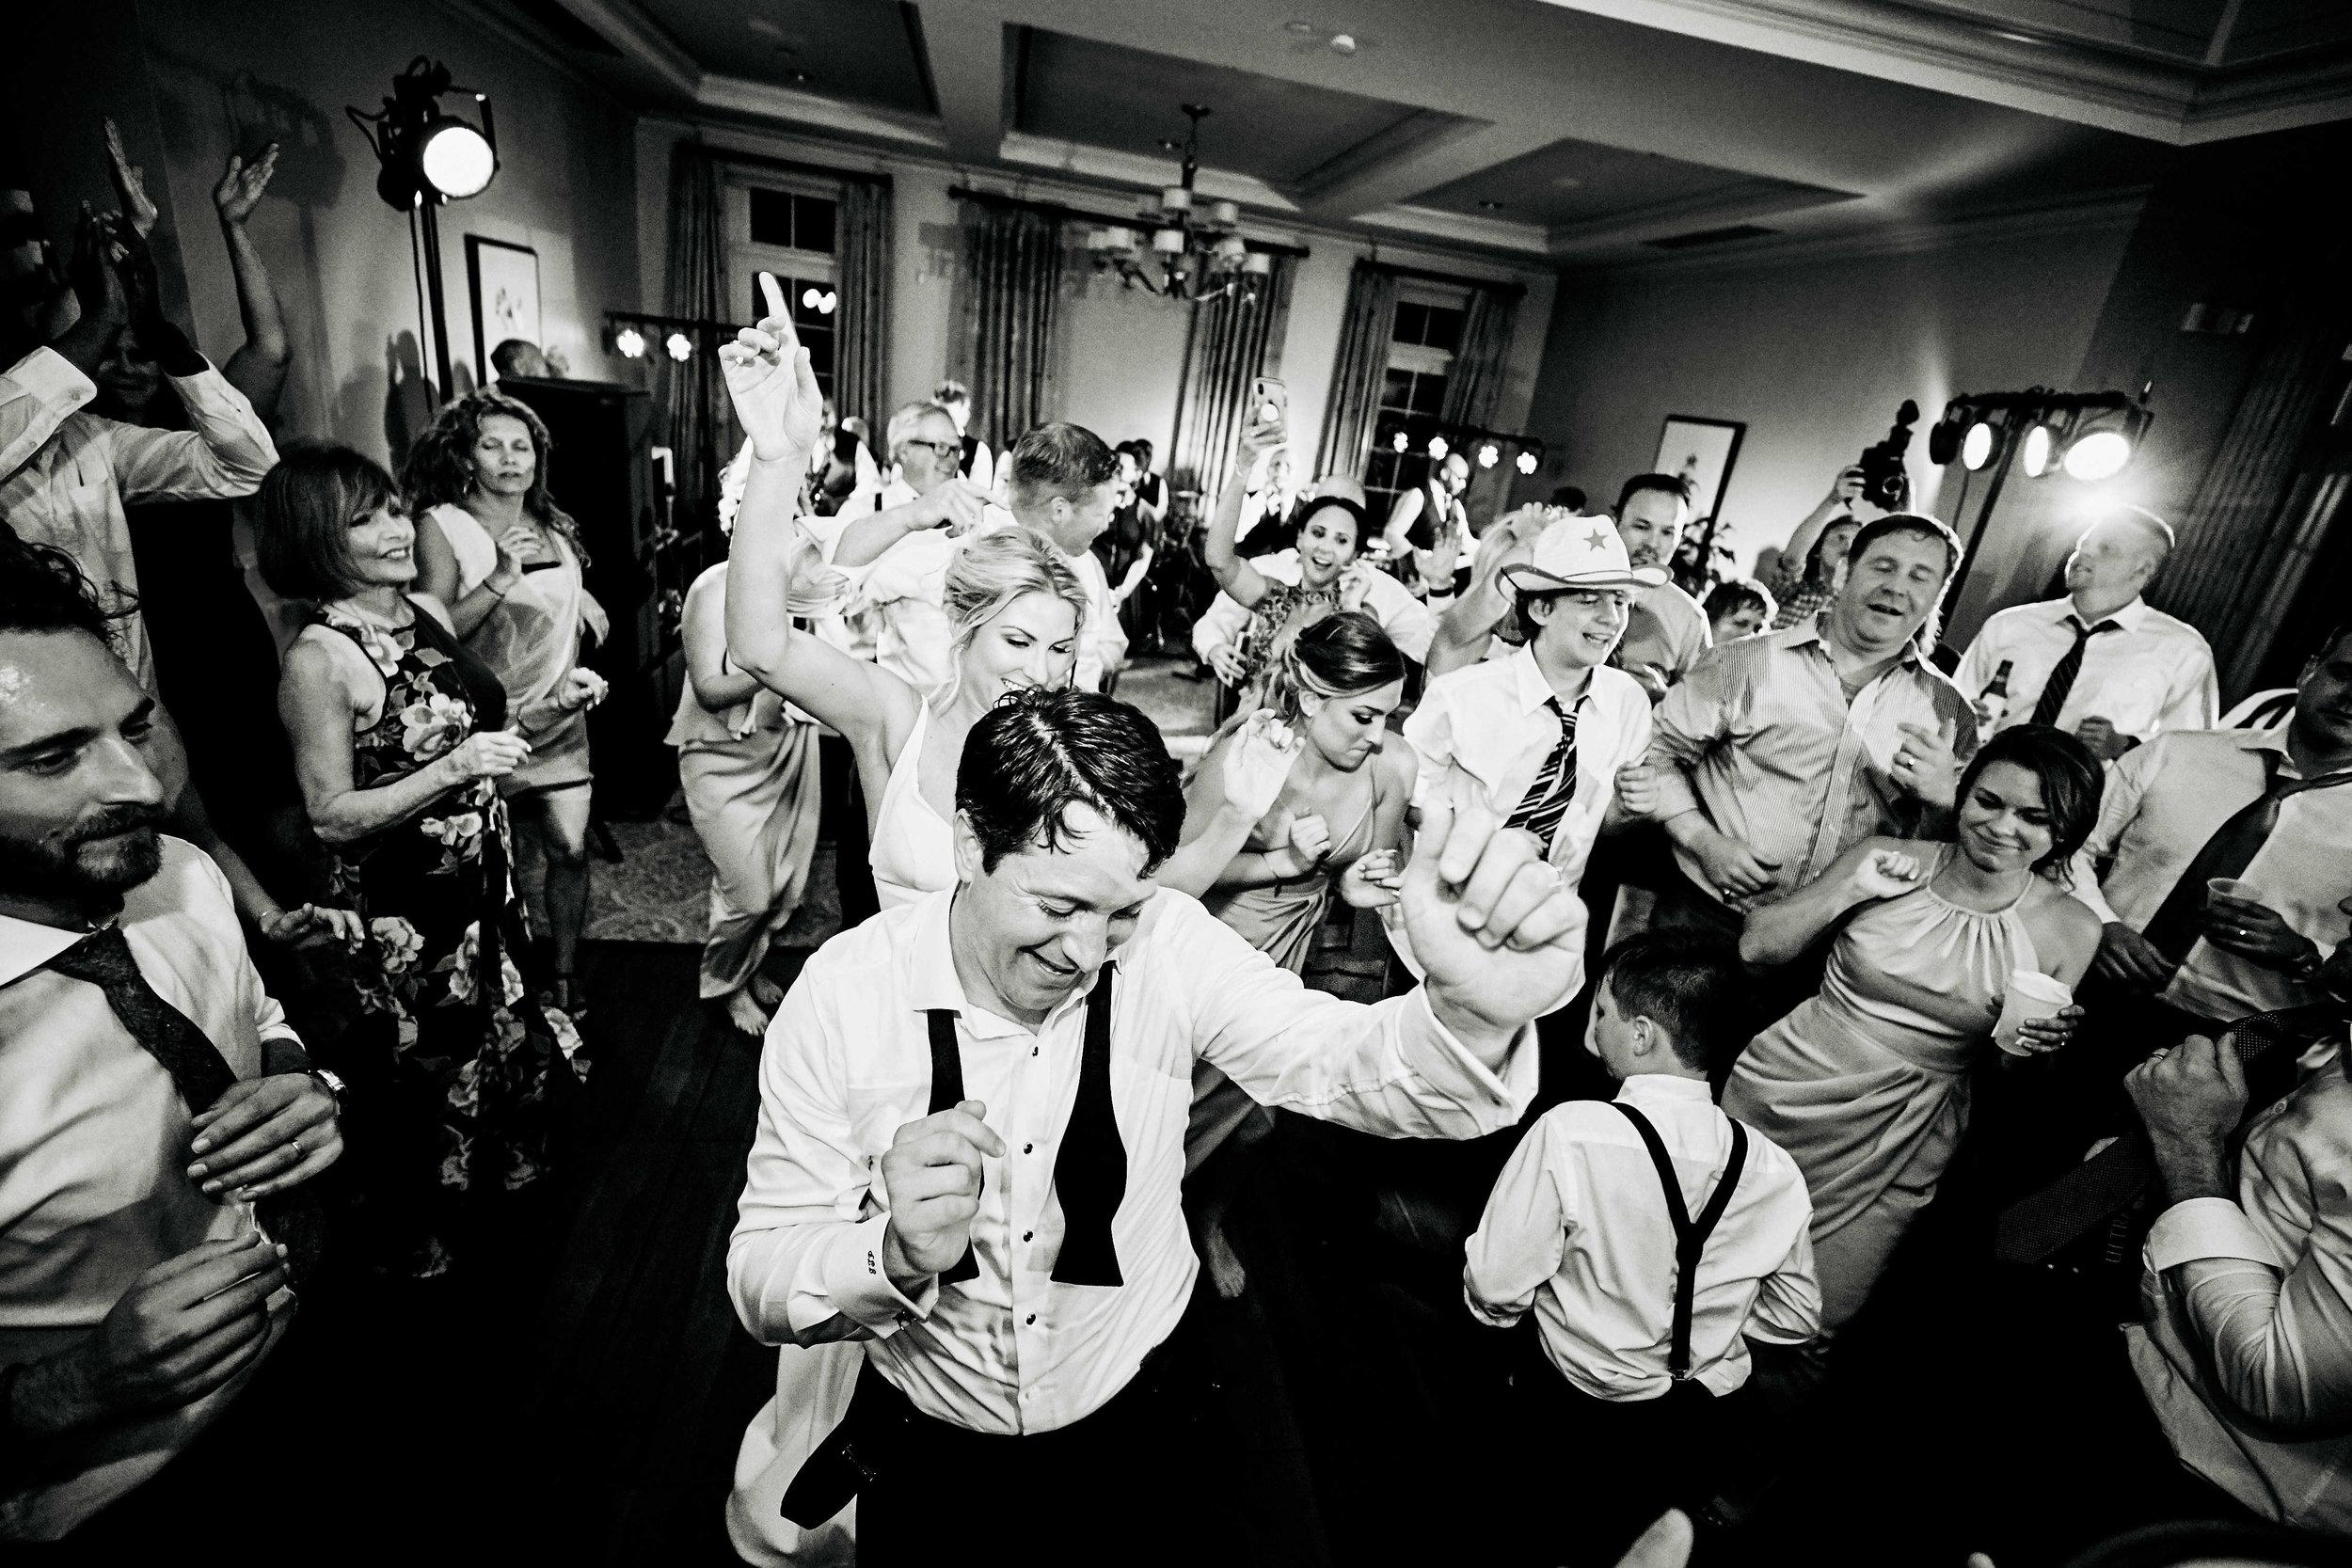 annie-and-greg-reception-savannah-georgia-belfair-plantation-party-fun-savannah-wedding-coordinator-family-and-friends-dancing-singing-band.jpg